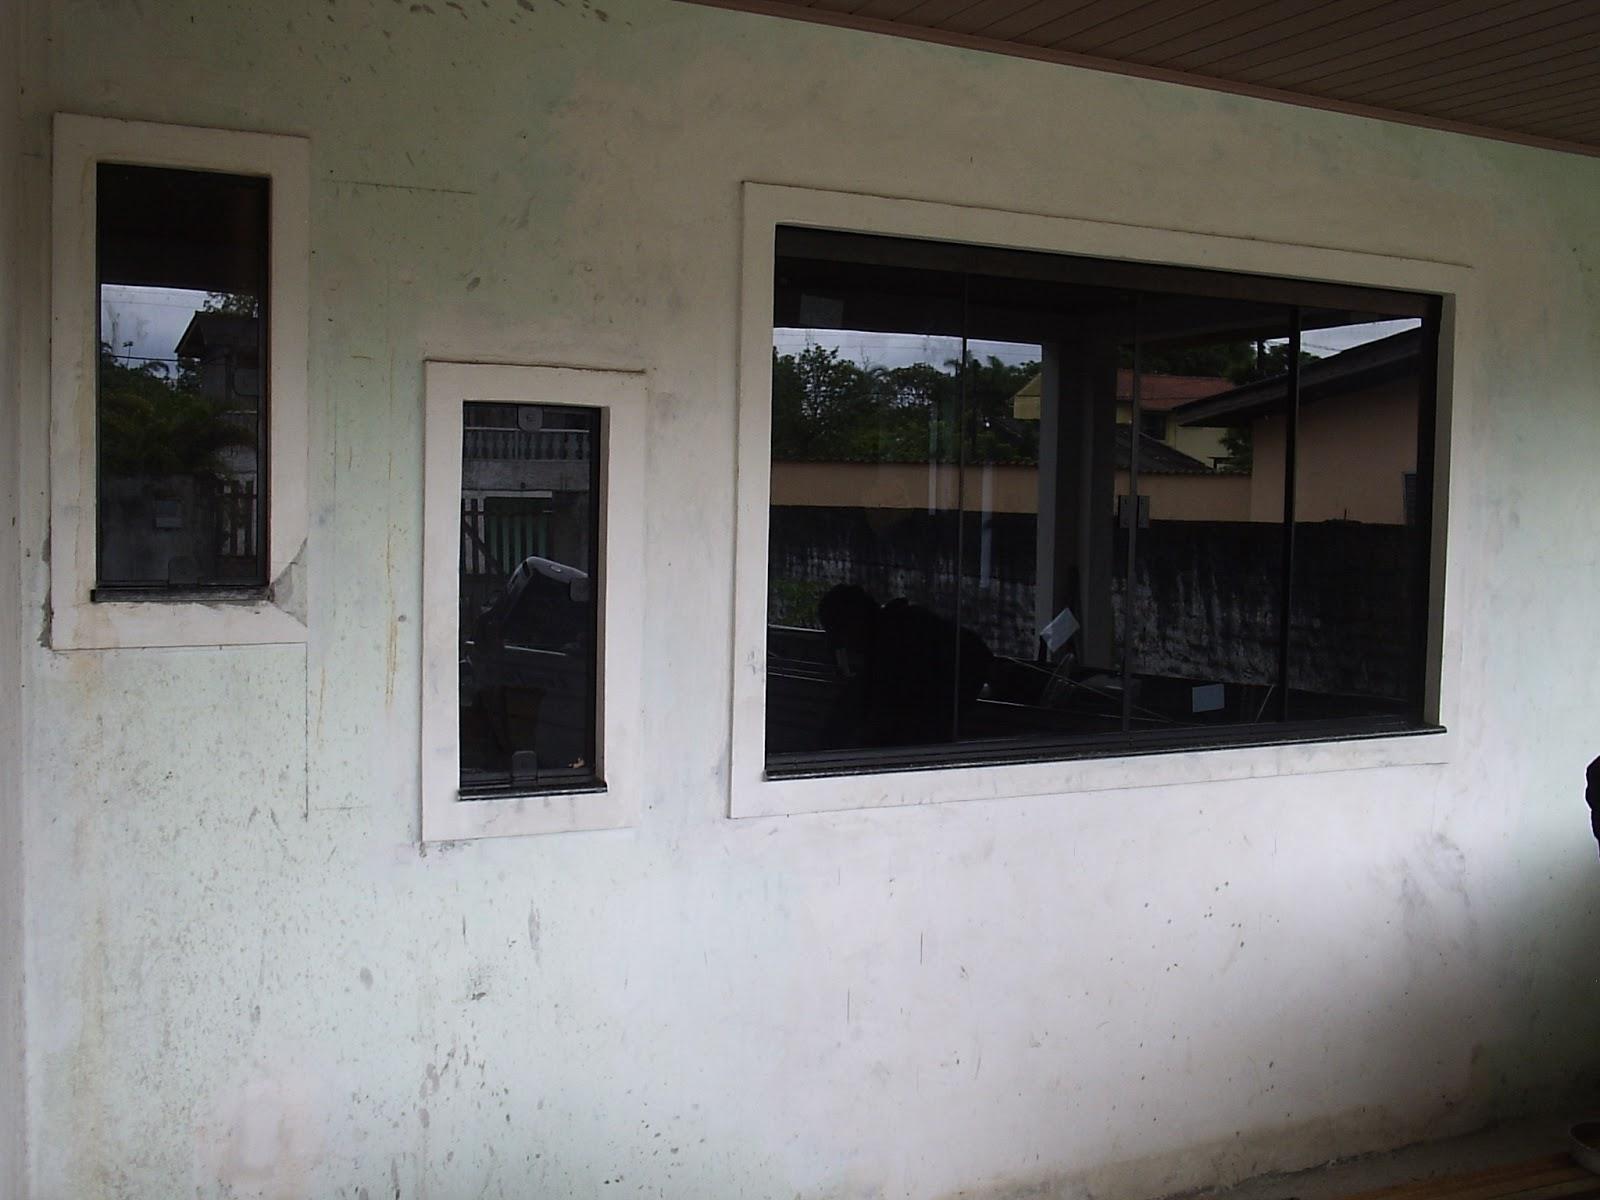 #585244 janela 4 folhas em vidro temperado 8mm fumê maxi ar em vidro  132 Janelas De Vidro Fume